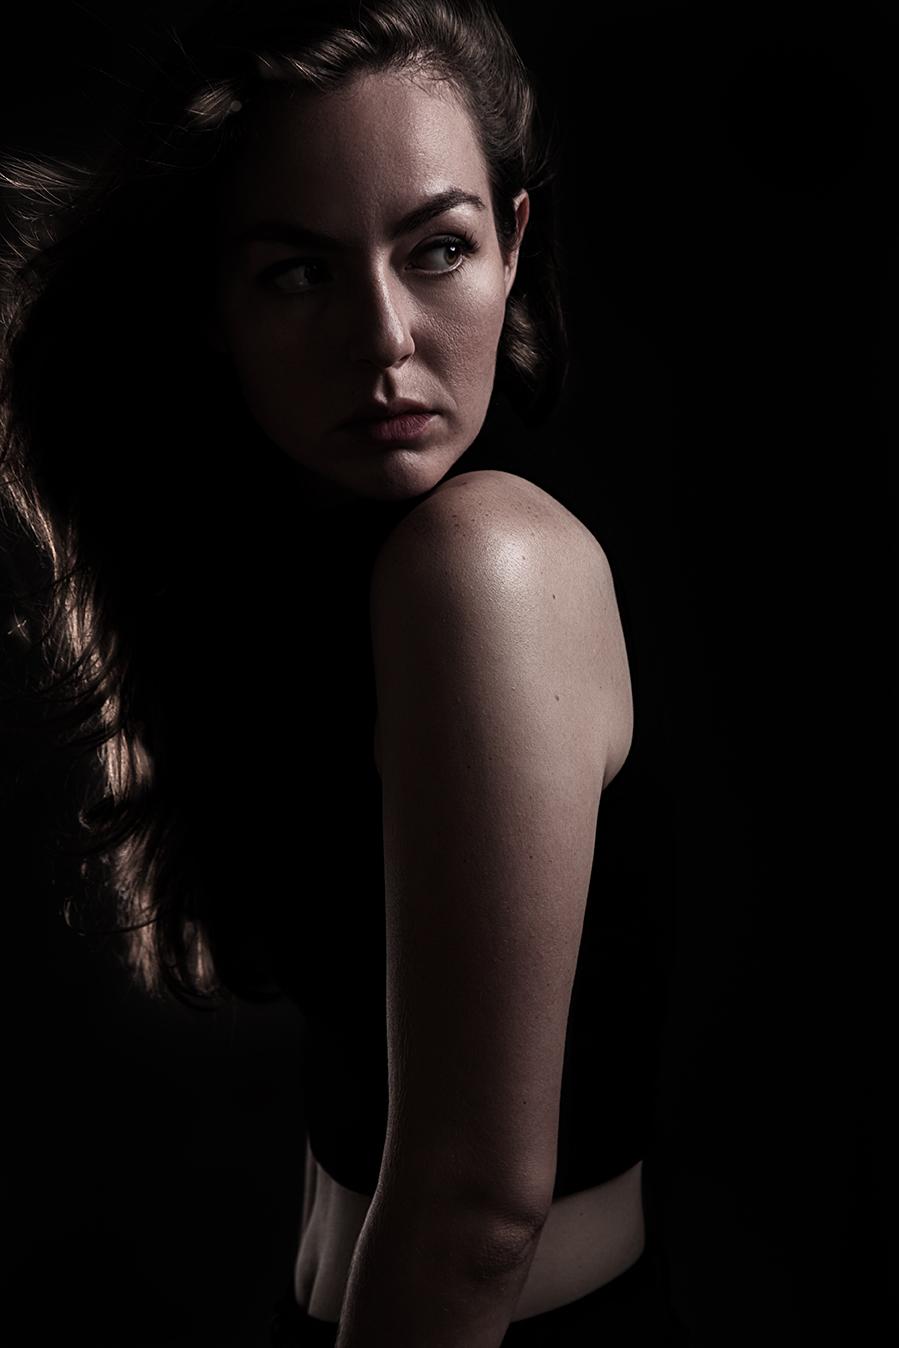 Heather Higginbotham